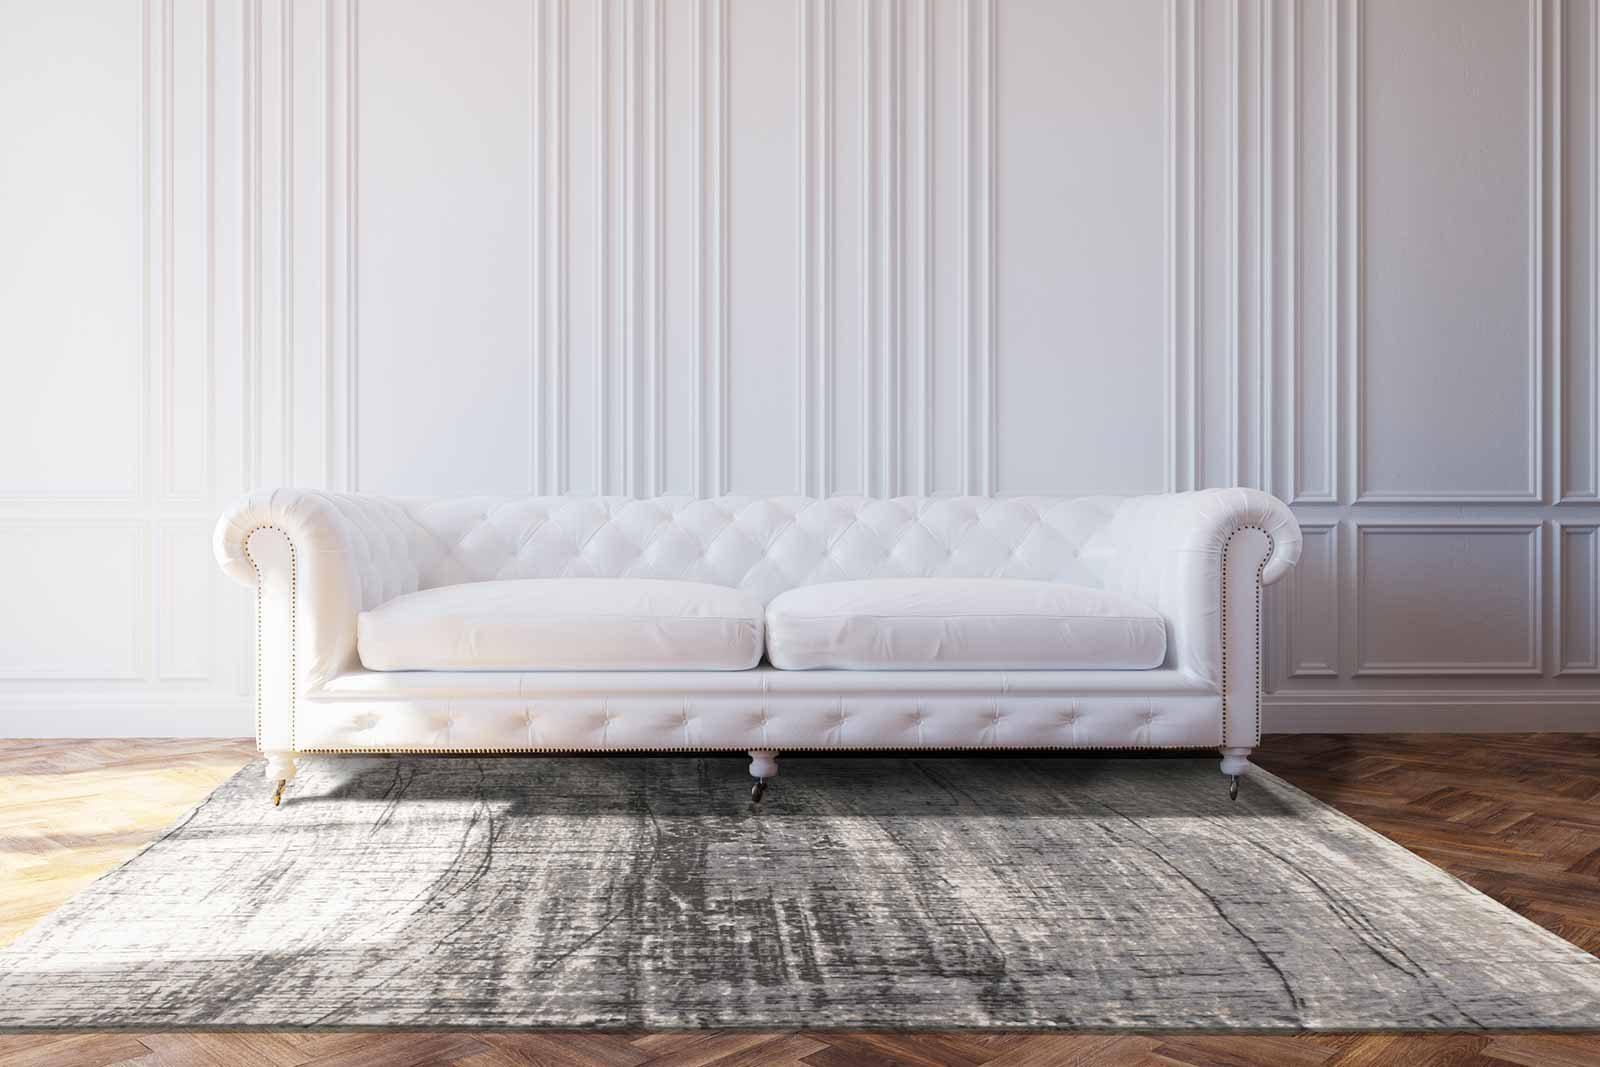 rugs Louis De Poortere LX8420 Mad Men Griff Jersey Stone interior